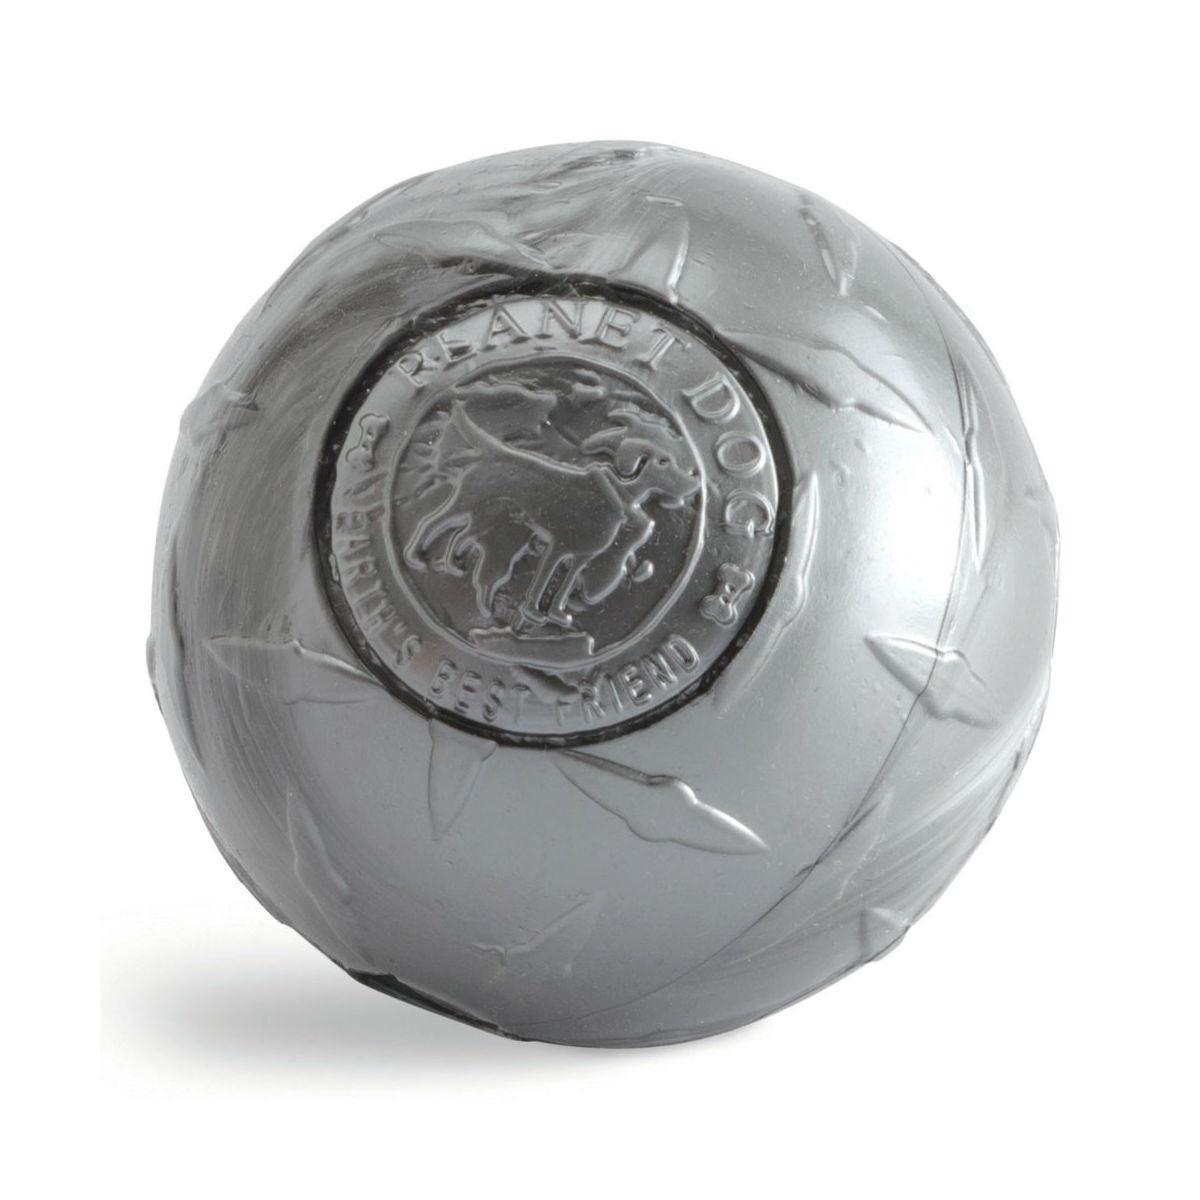 Planet Dog Orbee-Tuff Diamond Plate Ball Dog Toy - Silver